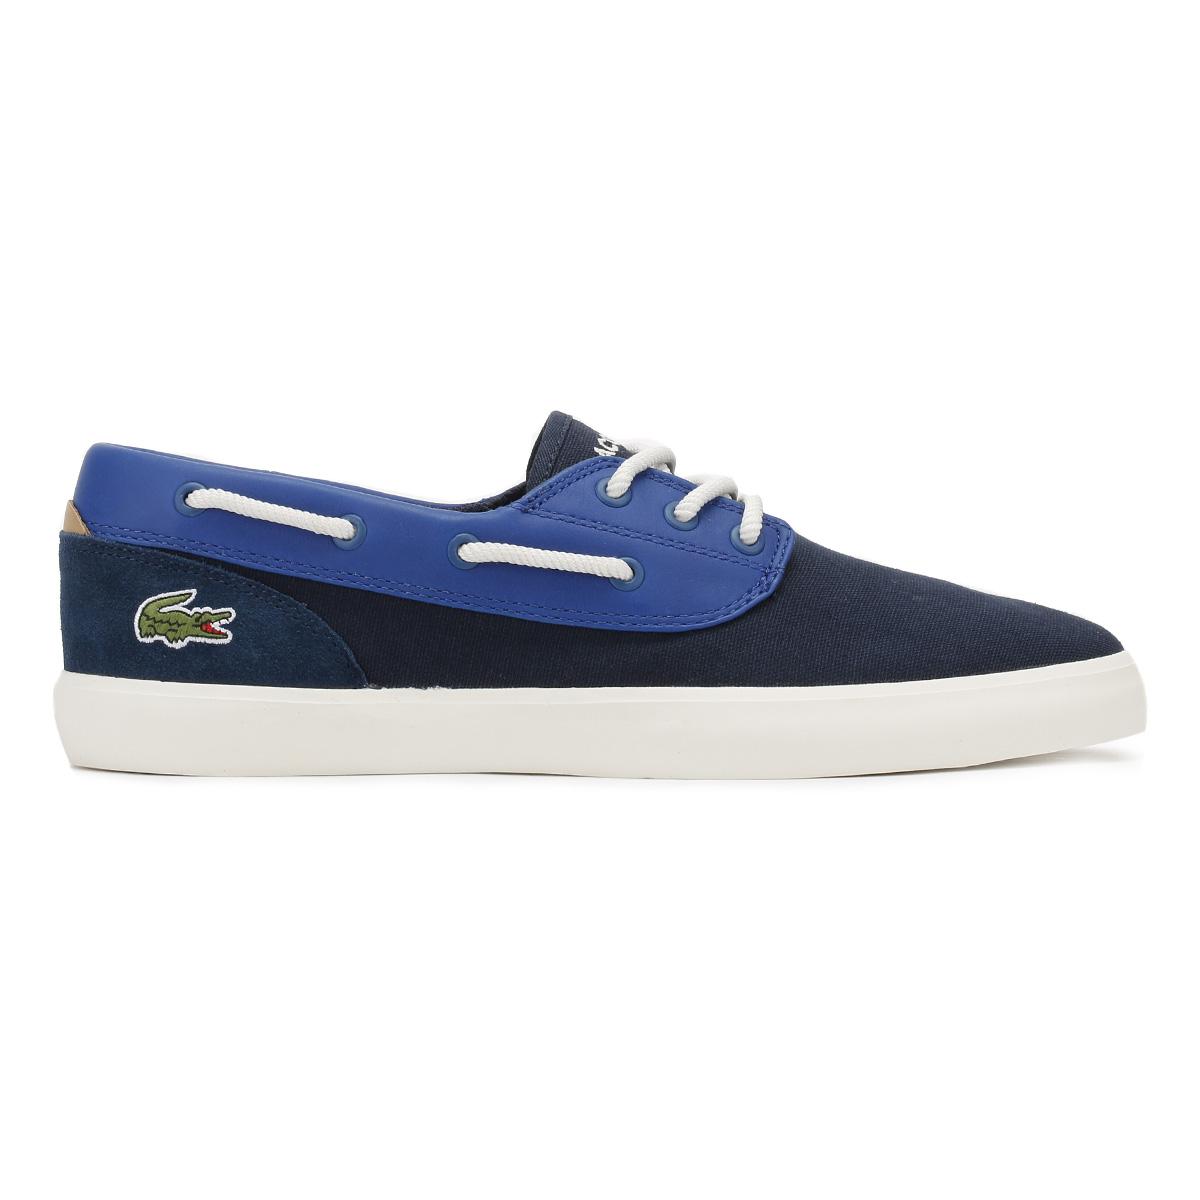 Casual oder Deck Schwarz 117 Sneakers Cam 1 Blau Mens Marineblau Schuhe Lacoste Jouer 0Evqx8